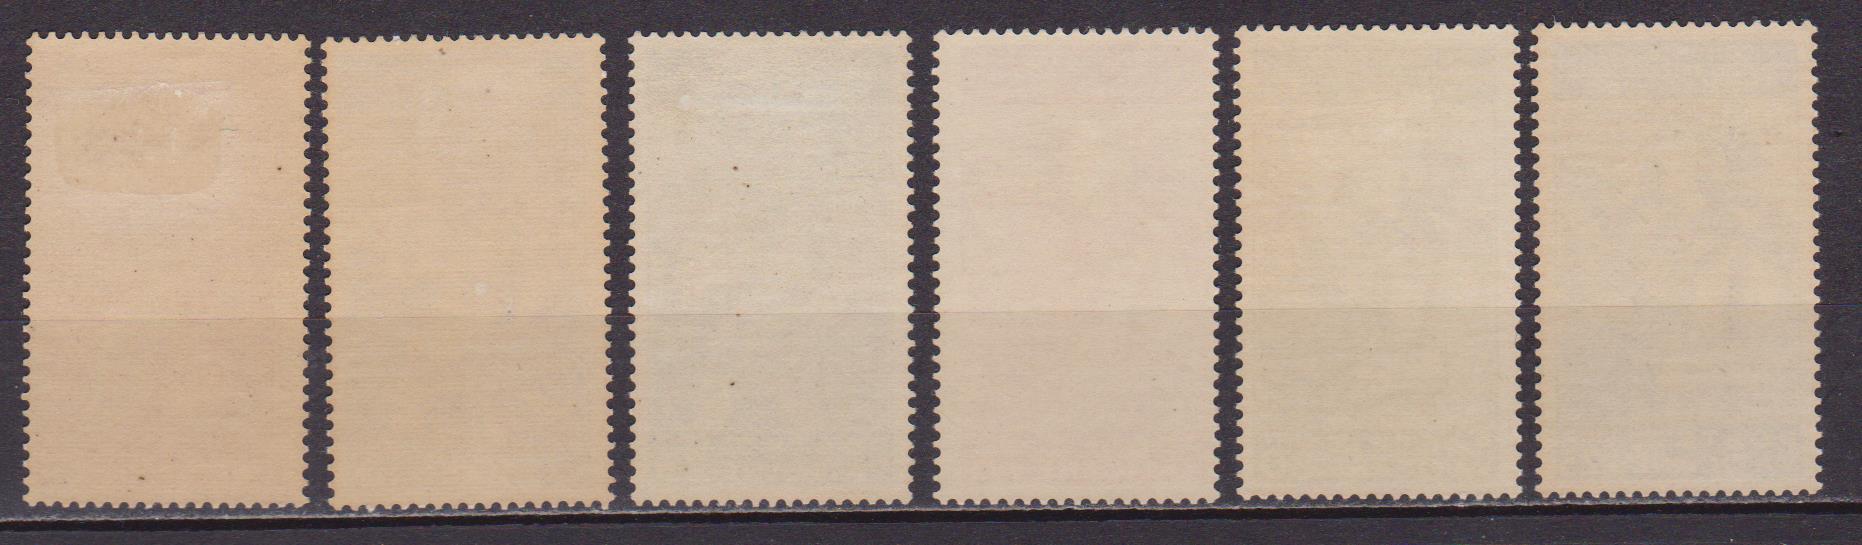 Vaticano 41-46 retro 001